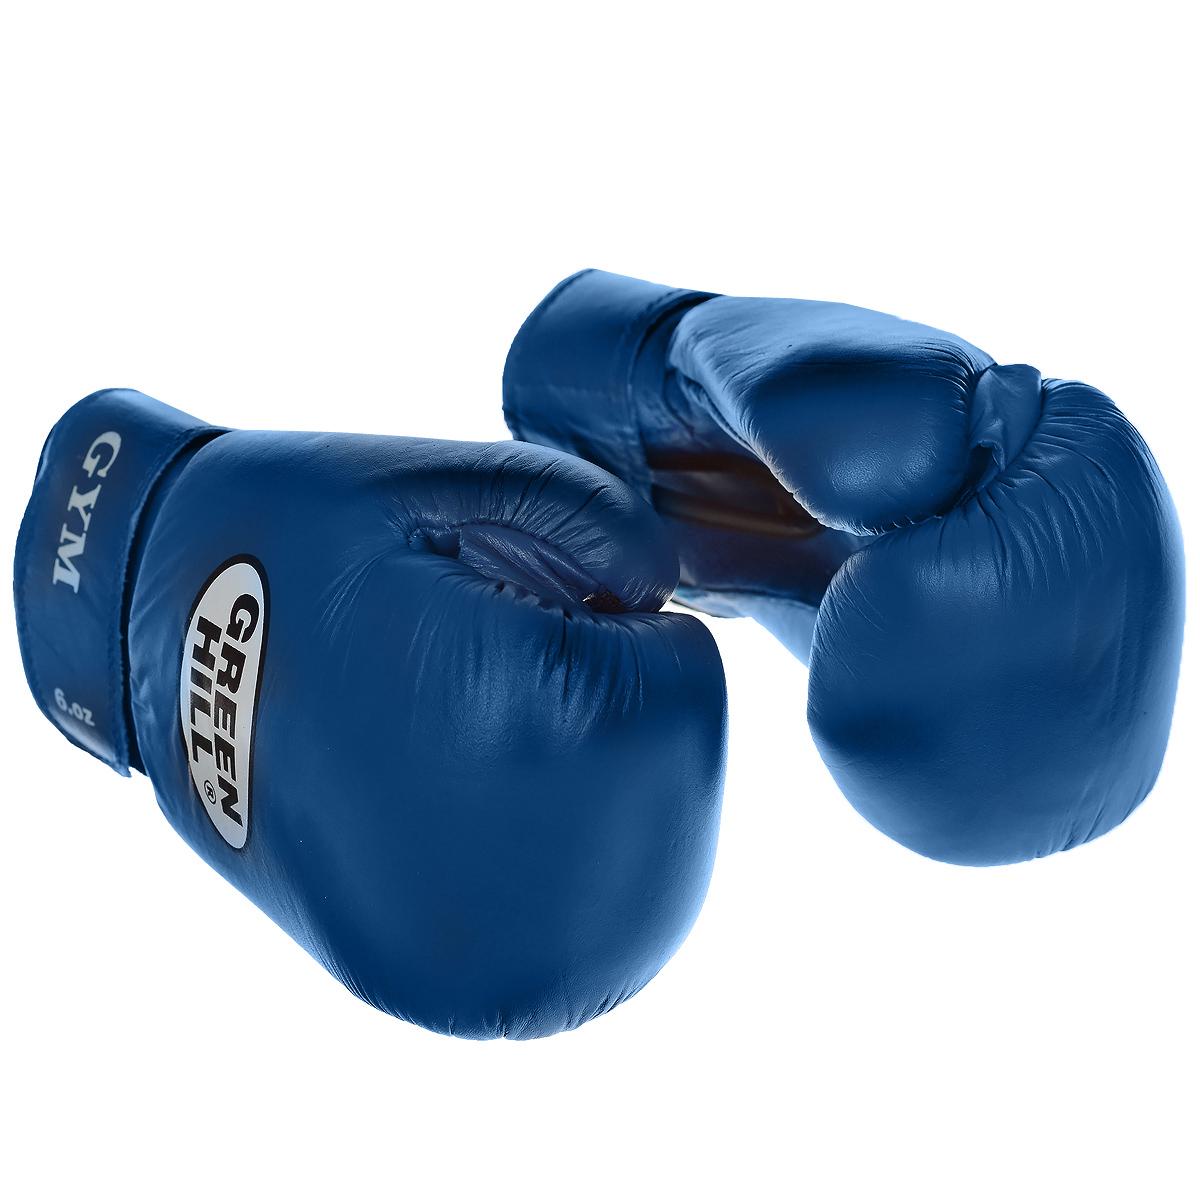 "Перчатки боксерские Green Hill ""Gym"", цвет: синий. Вес 12 унций BGG-2018"